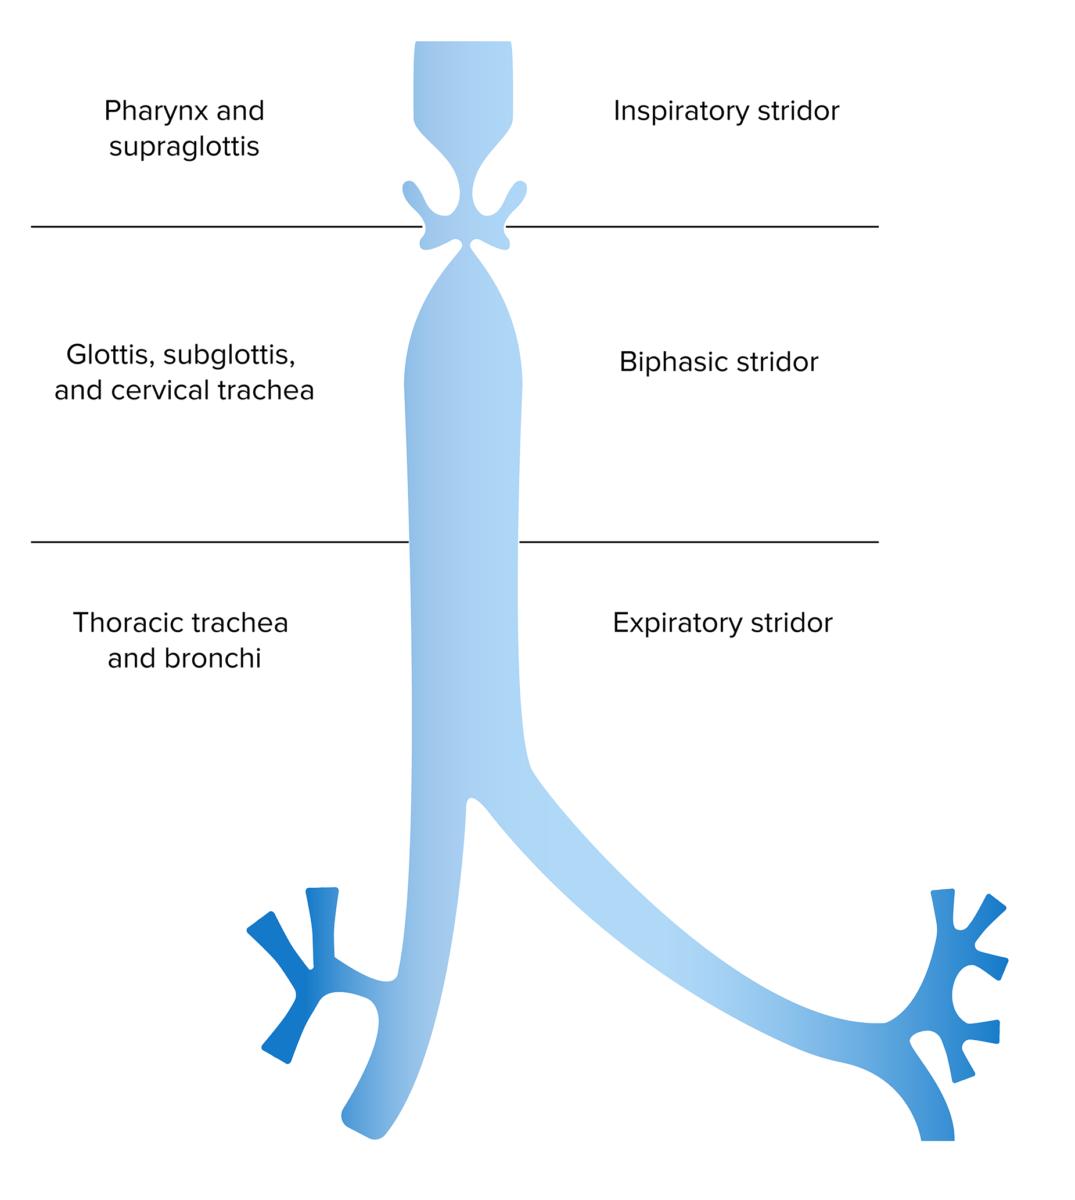 Anatomical location of obstruction based on inspiratory vs expiratory stridor